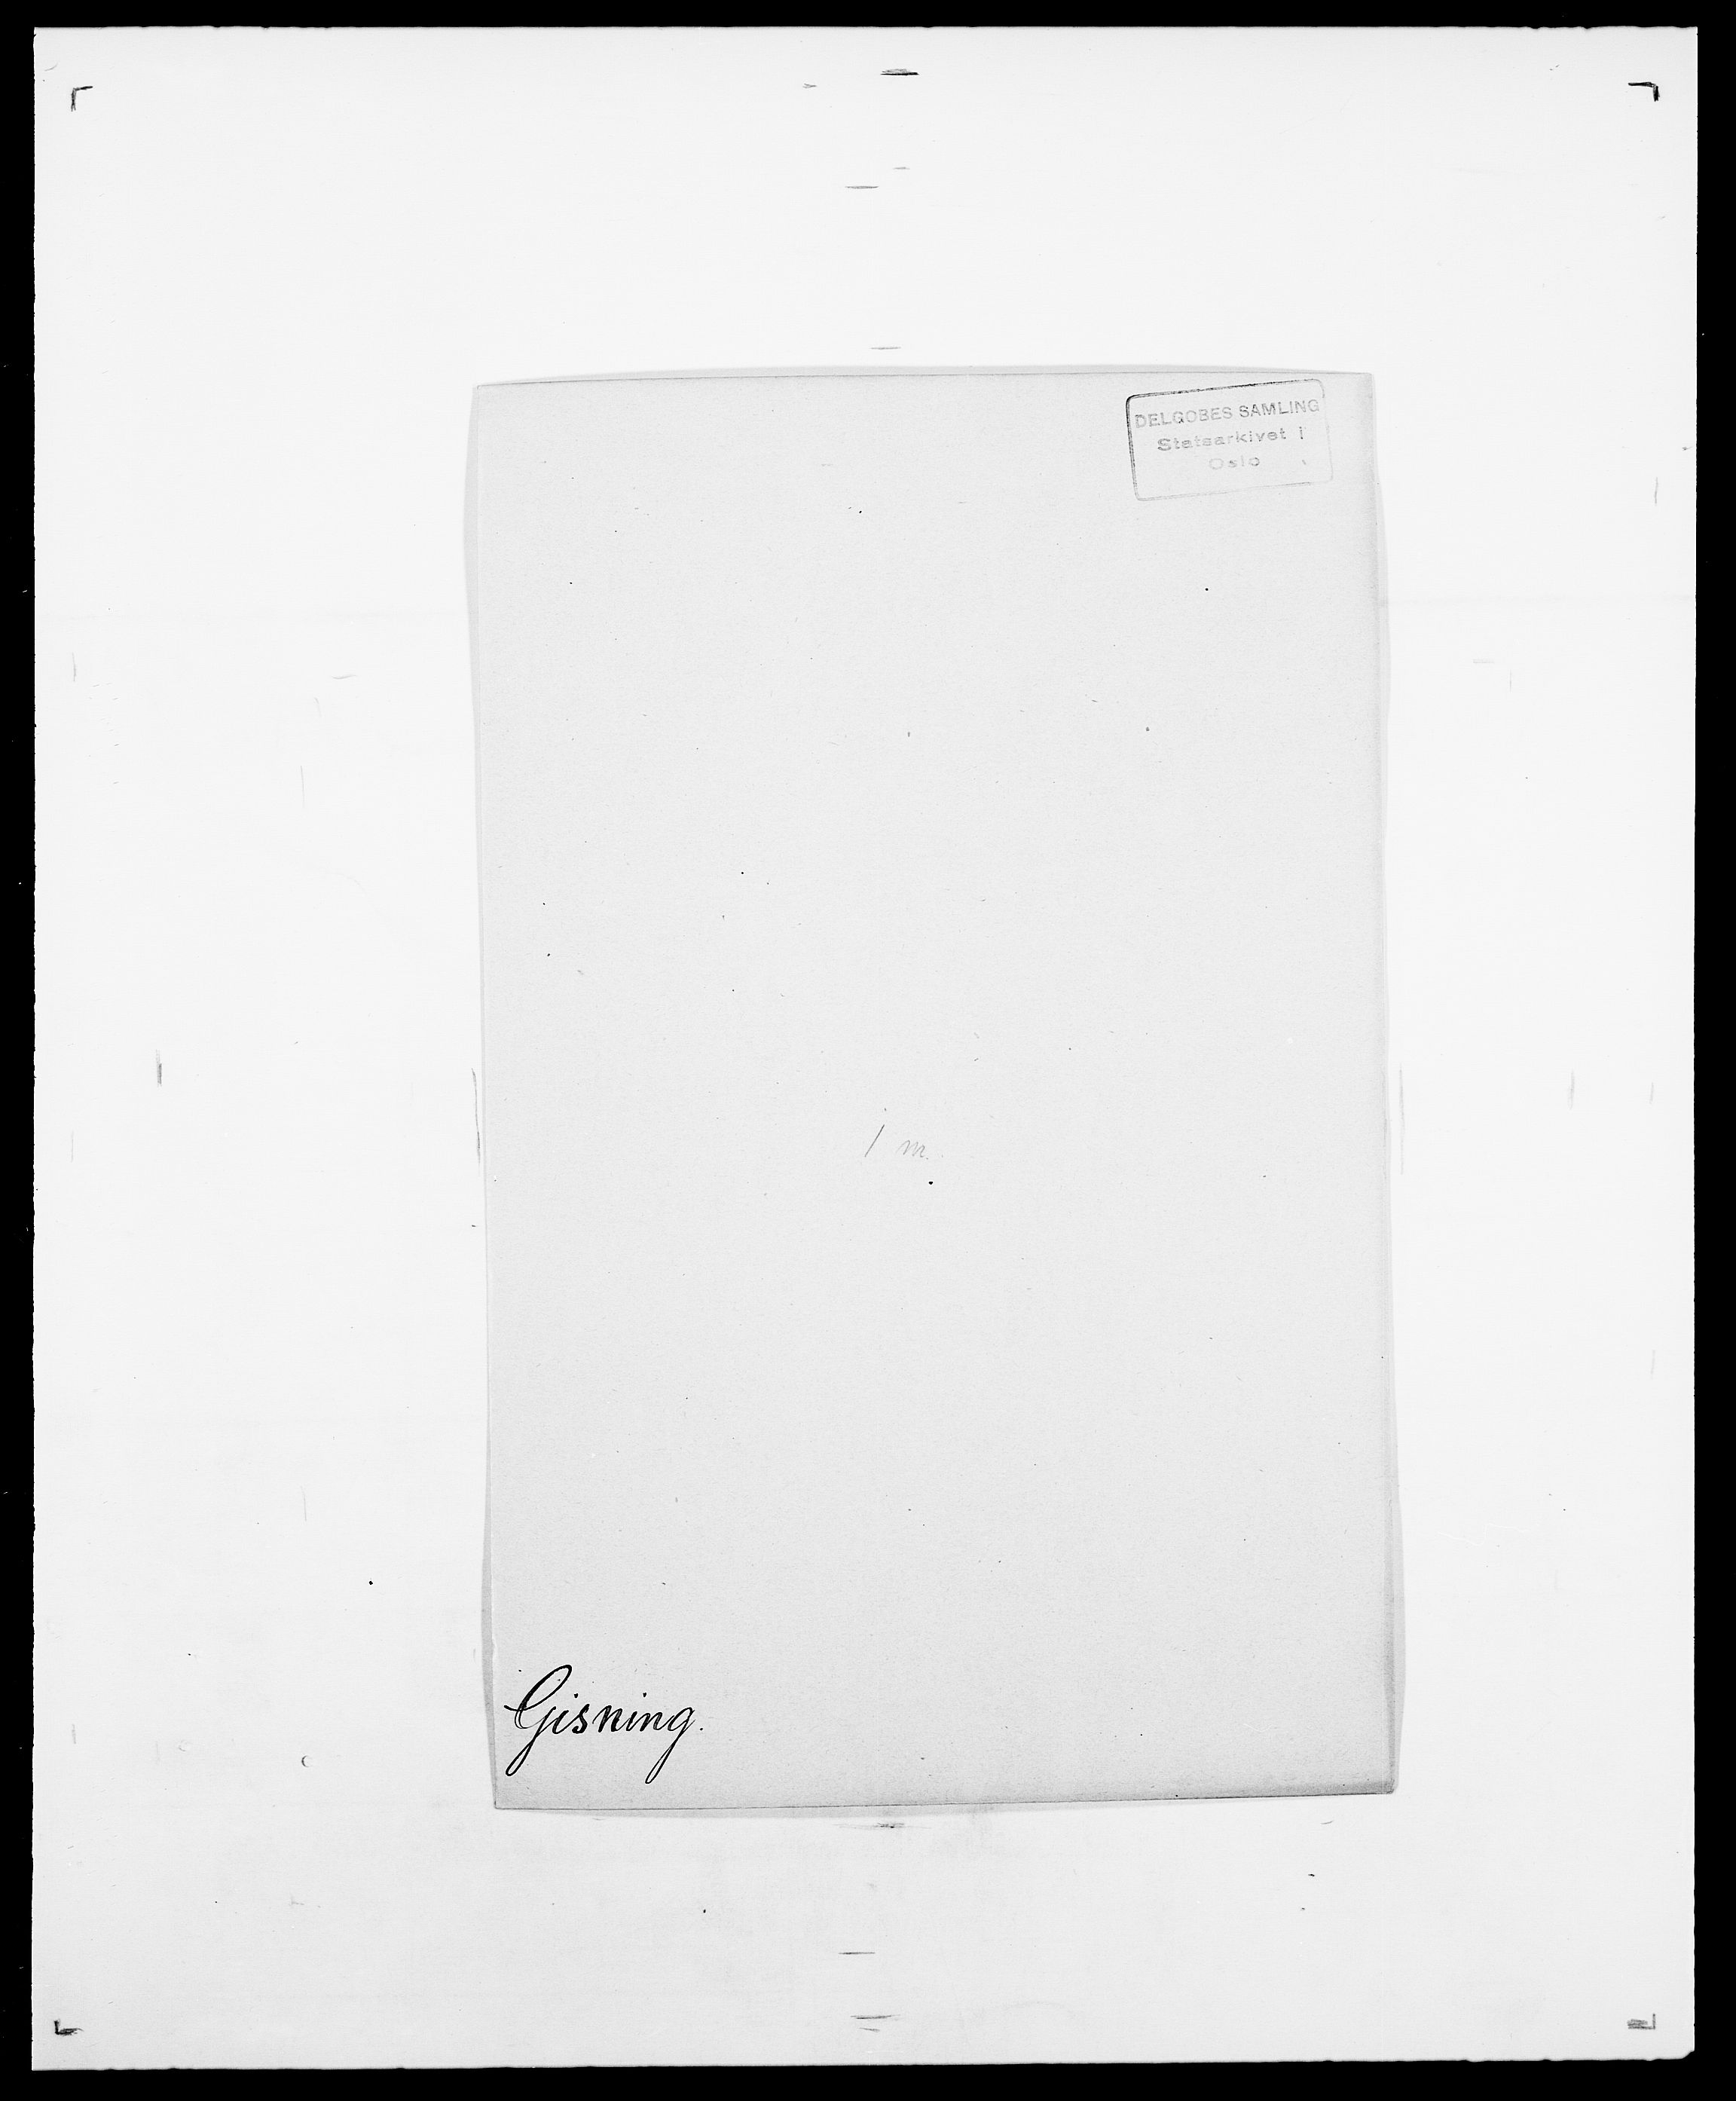 SAO, Delgobe, Charles Antoine - samling, D/Da/L0014: Giebdhausen - Grip, s. 52